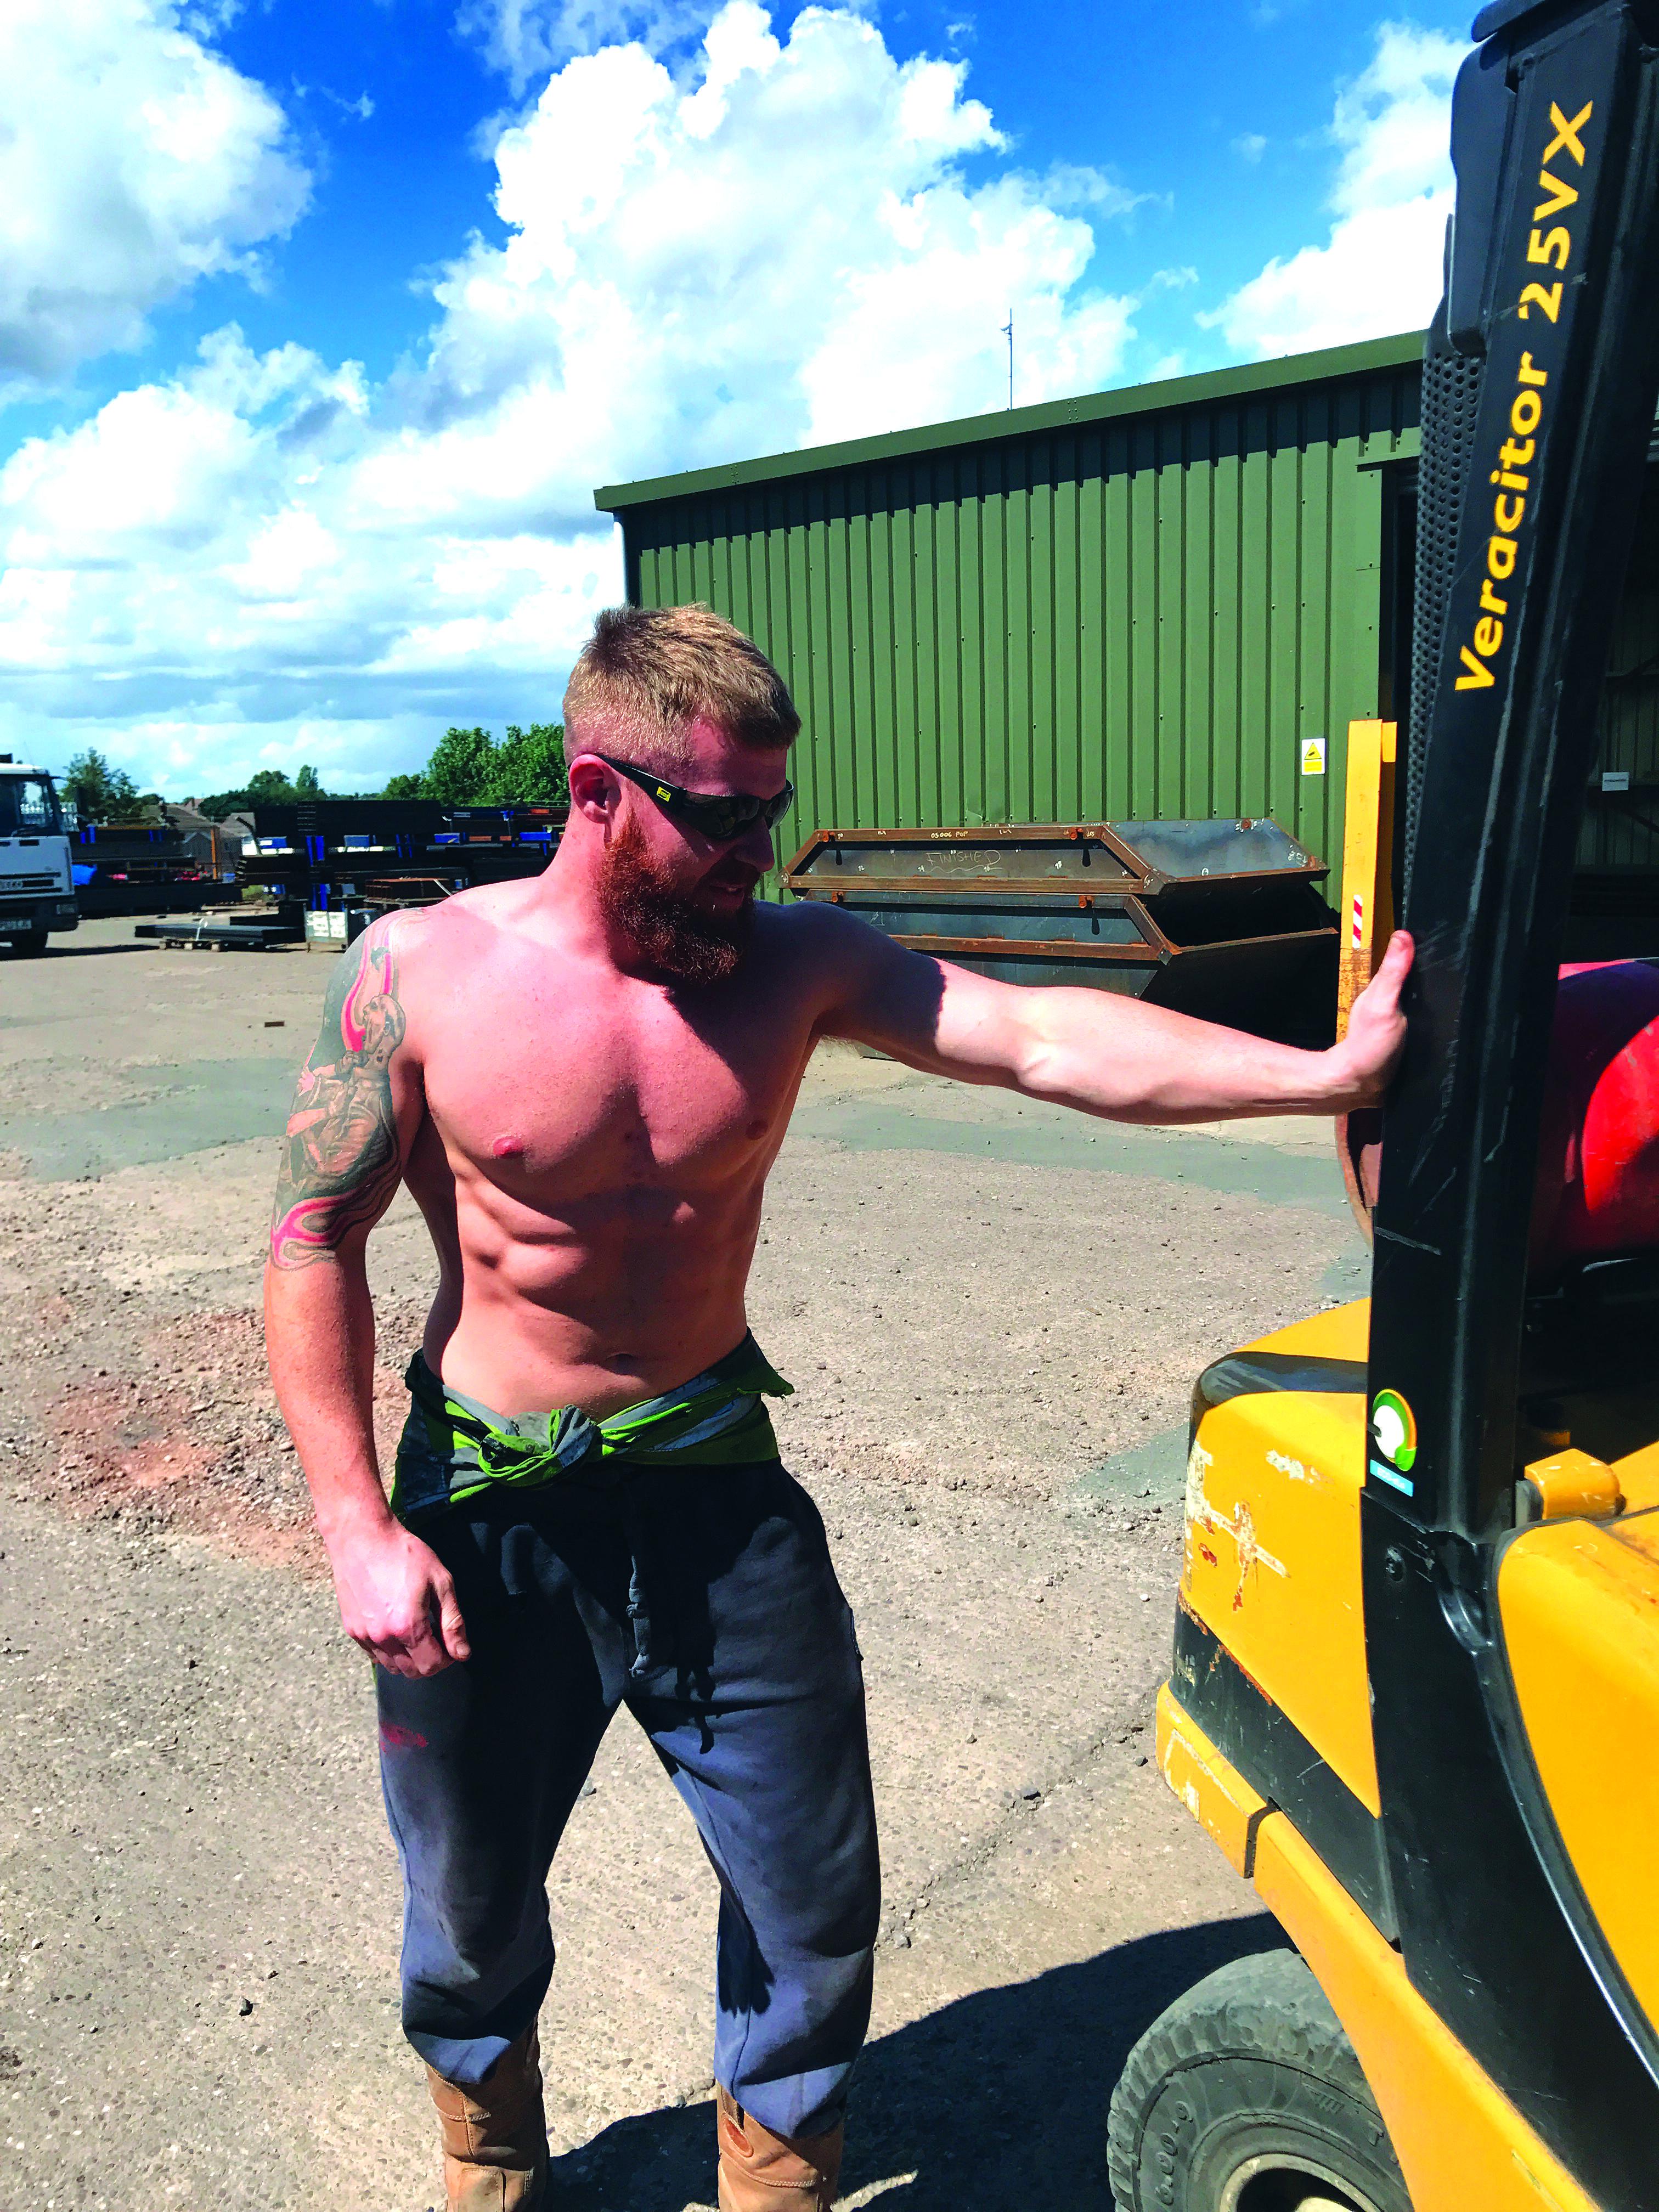 SKIP HUNK SEPTEMBER 2017 – Paddy Tonkinson, GJF Fabrications Ltd